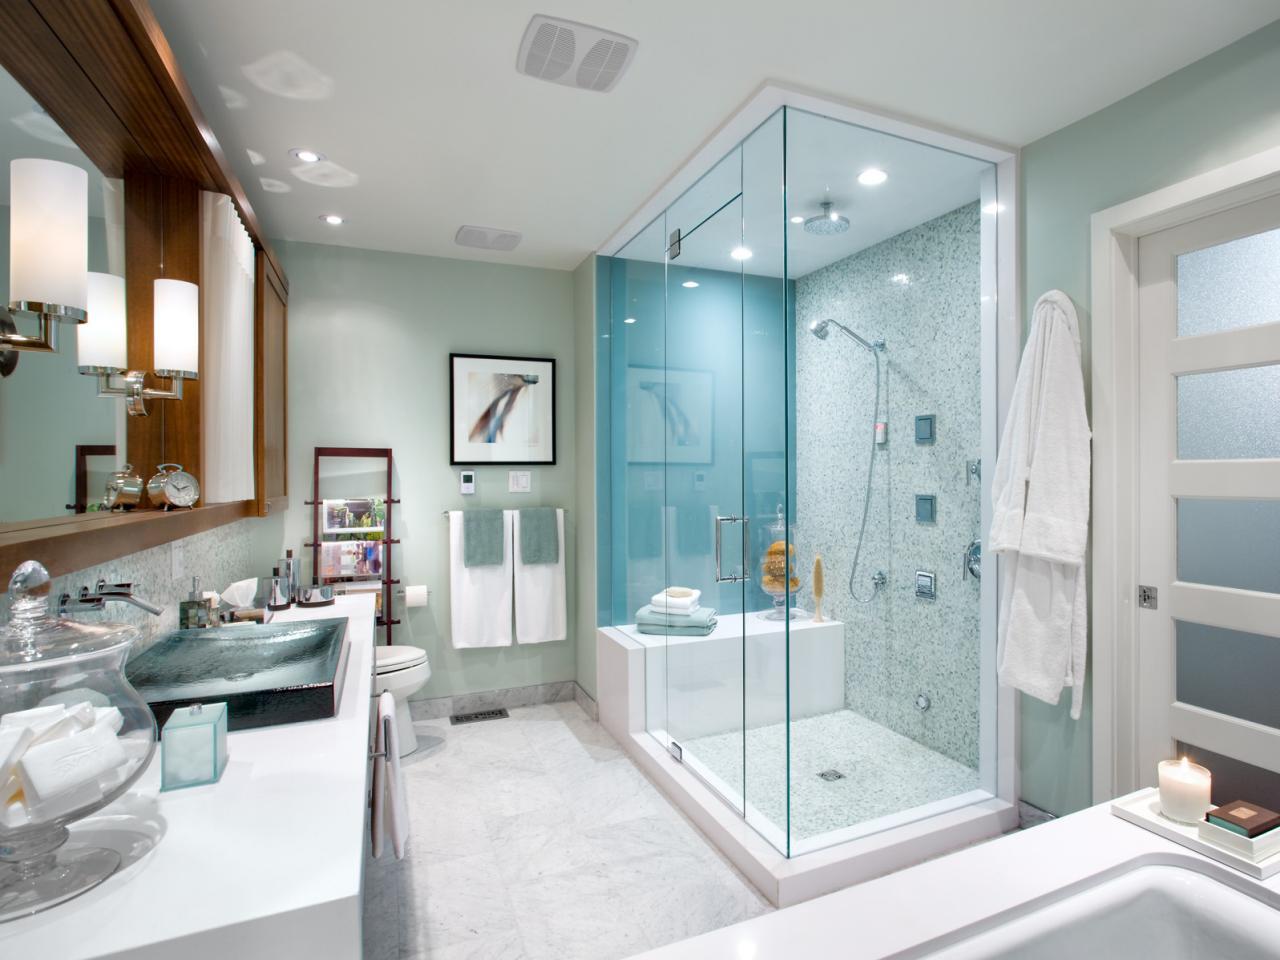 Spa Bathroom Design Ideas Toile All over » Design and Ideas